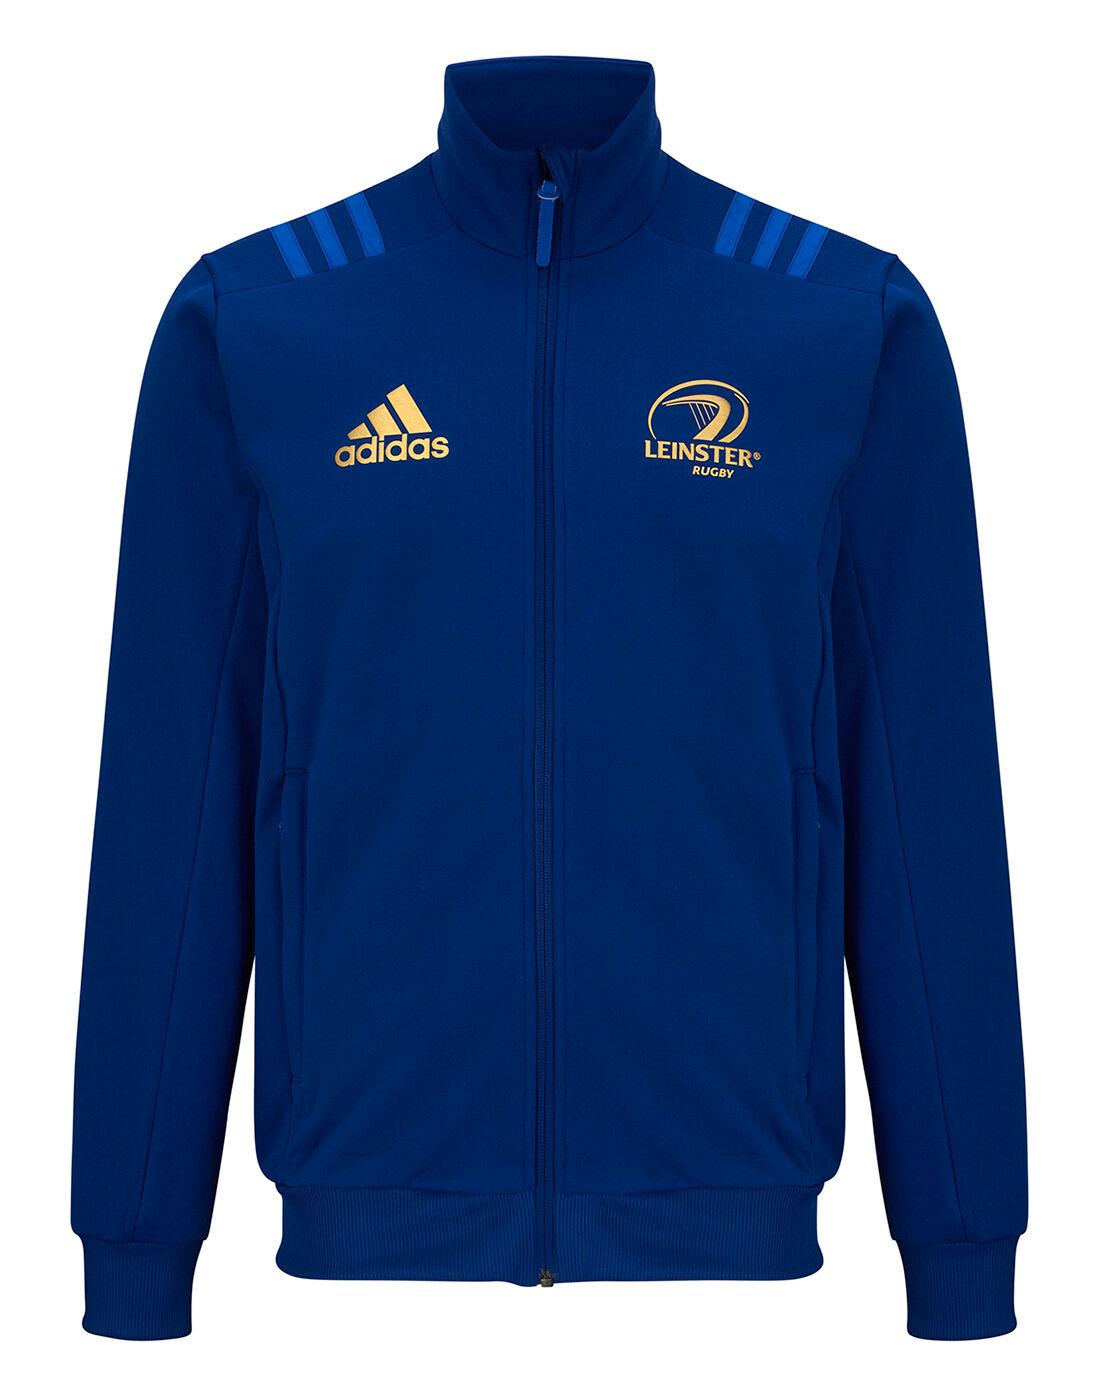 adidas Adult Leinster Fleece 201819